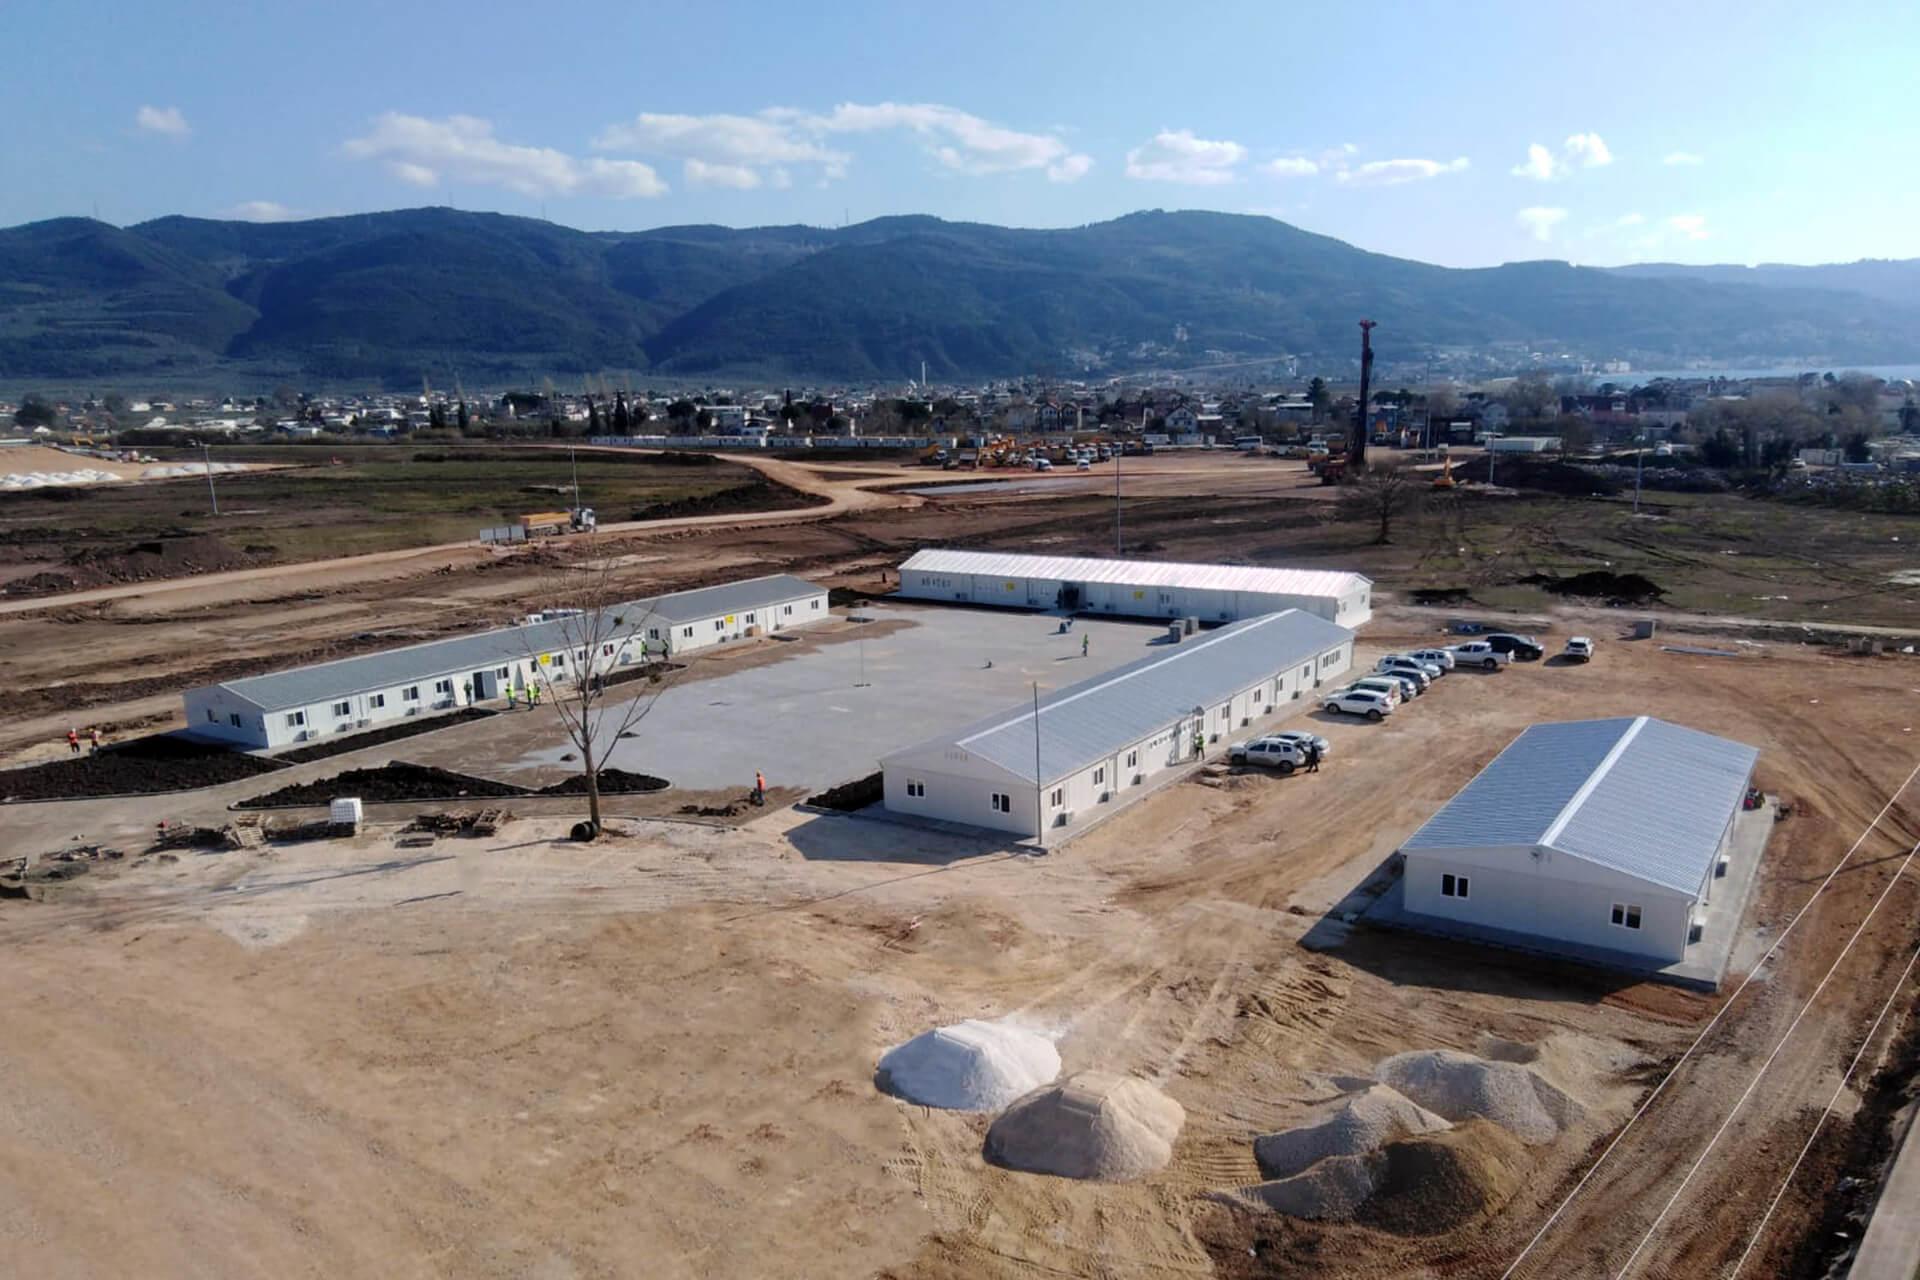 Labor Camp Project